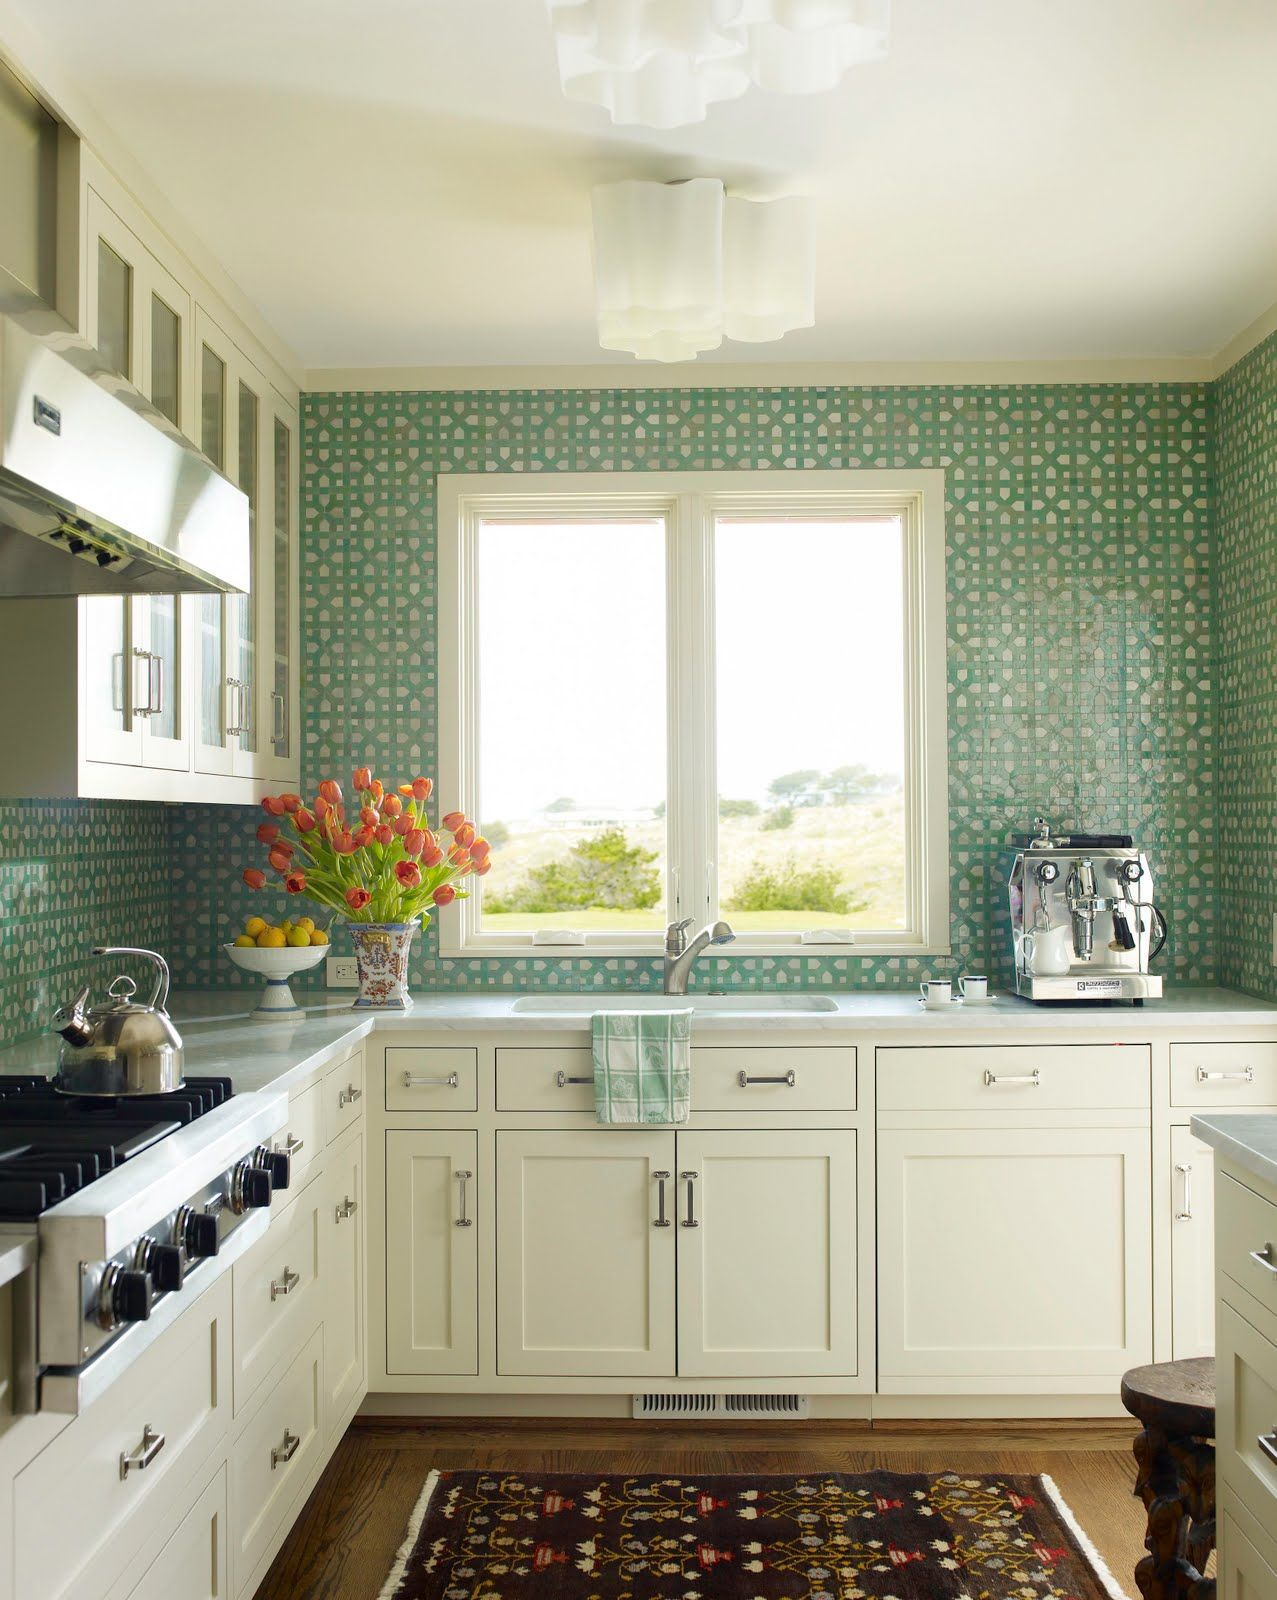 Great kitchen mosaic tile backsplash http cococozy com green tiles